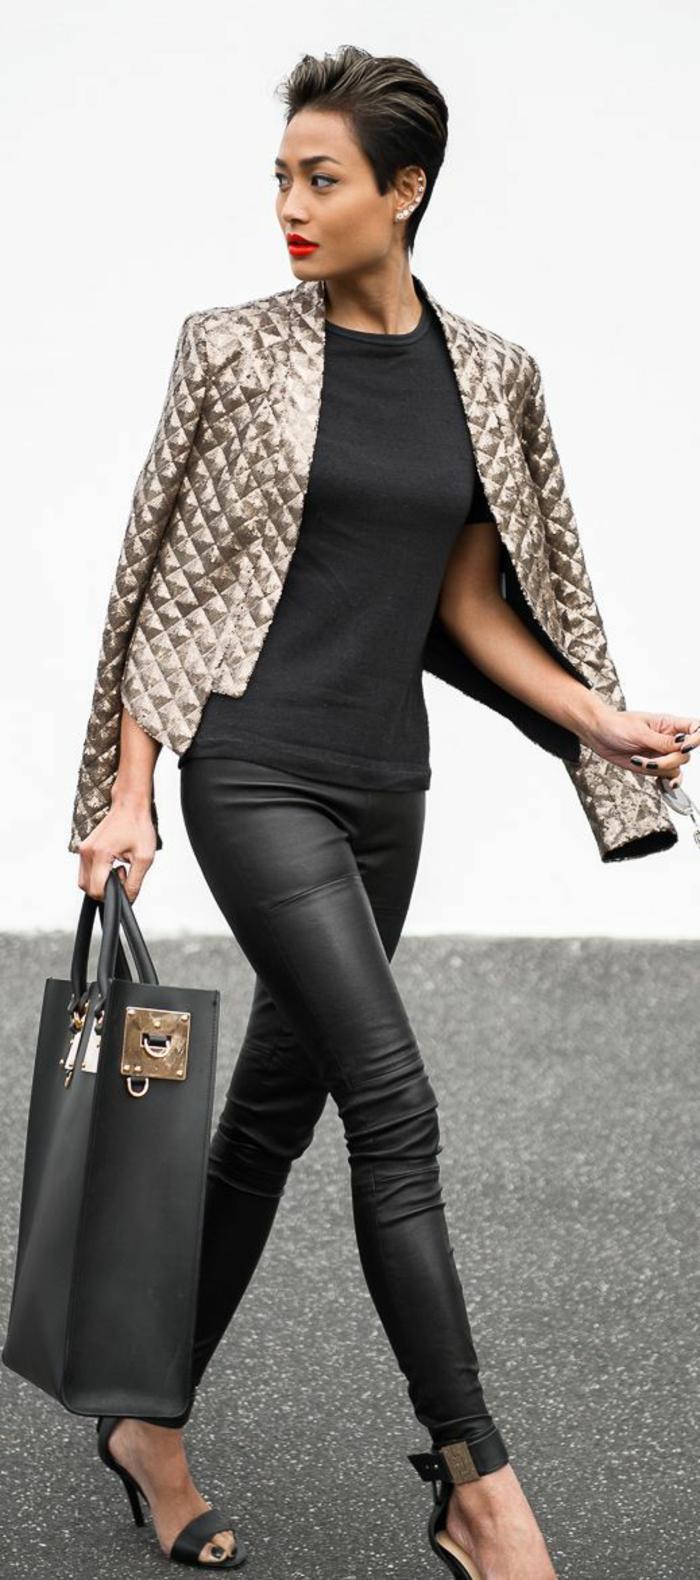 look-élégant-legging-effet-cuir-gros-sac-à-mains